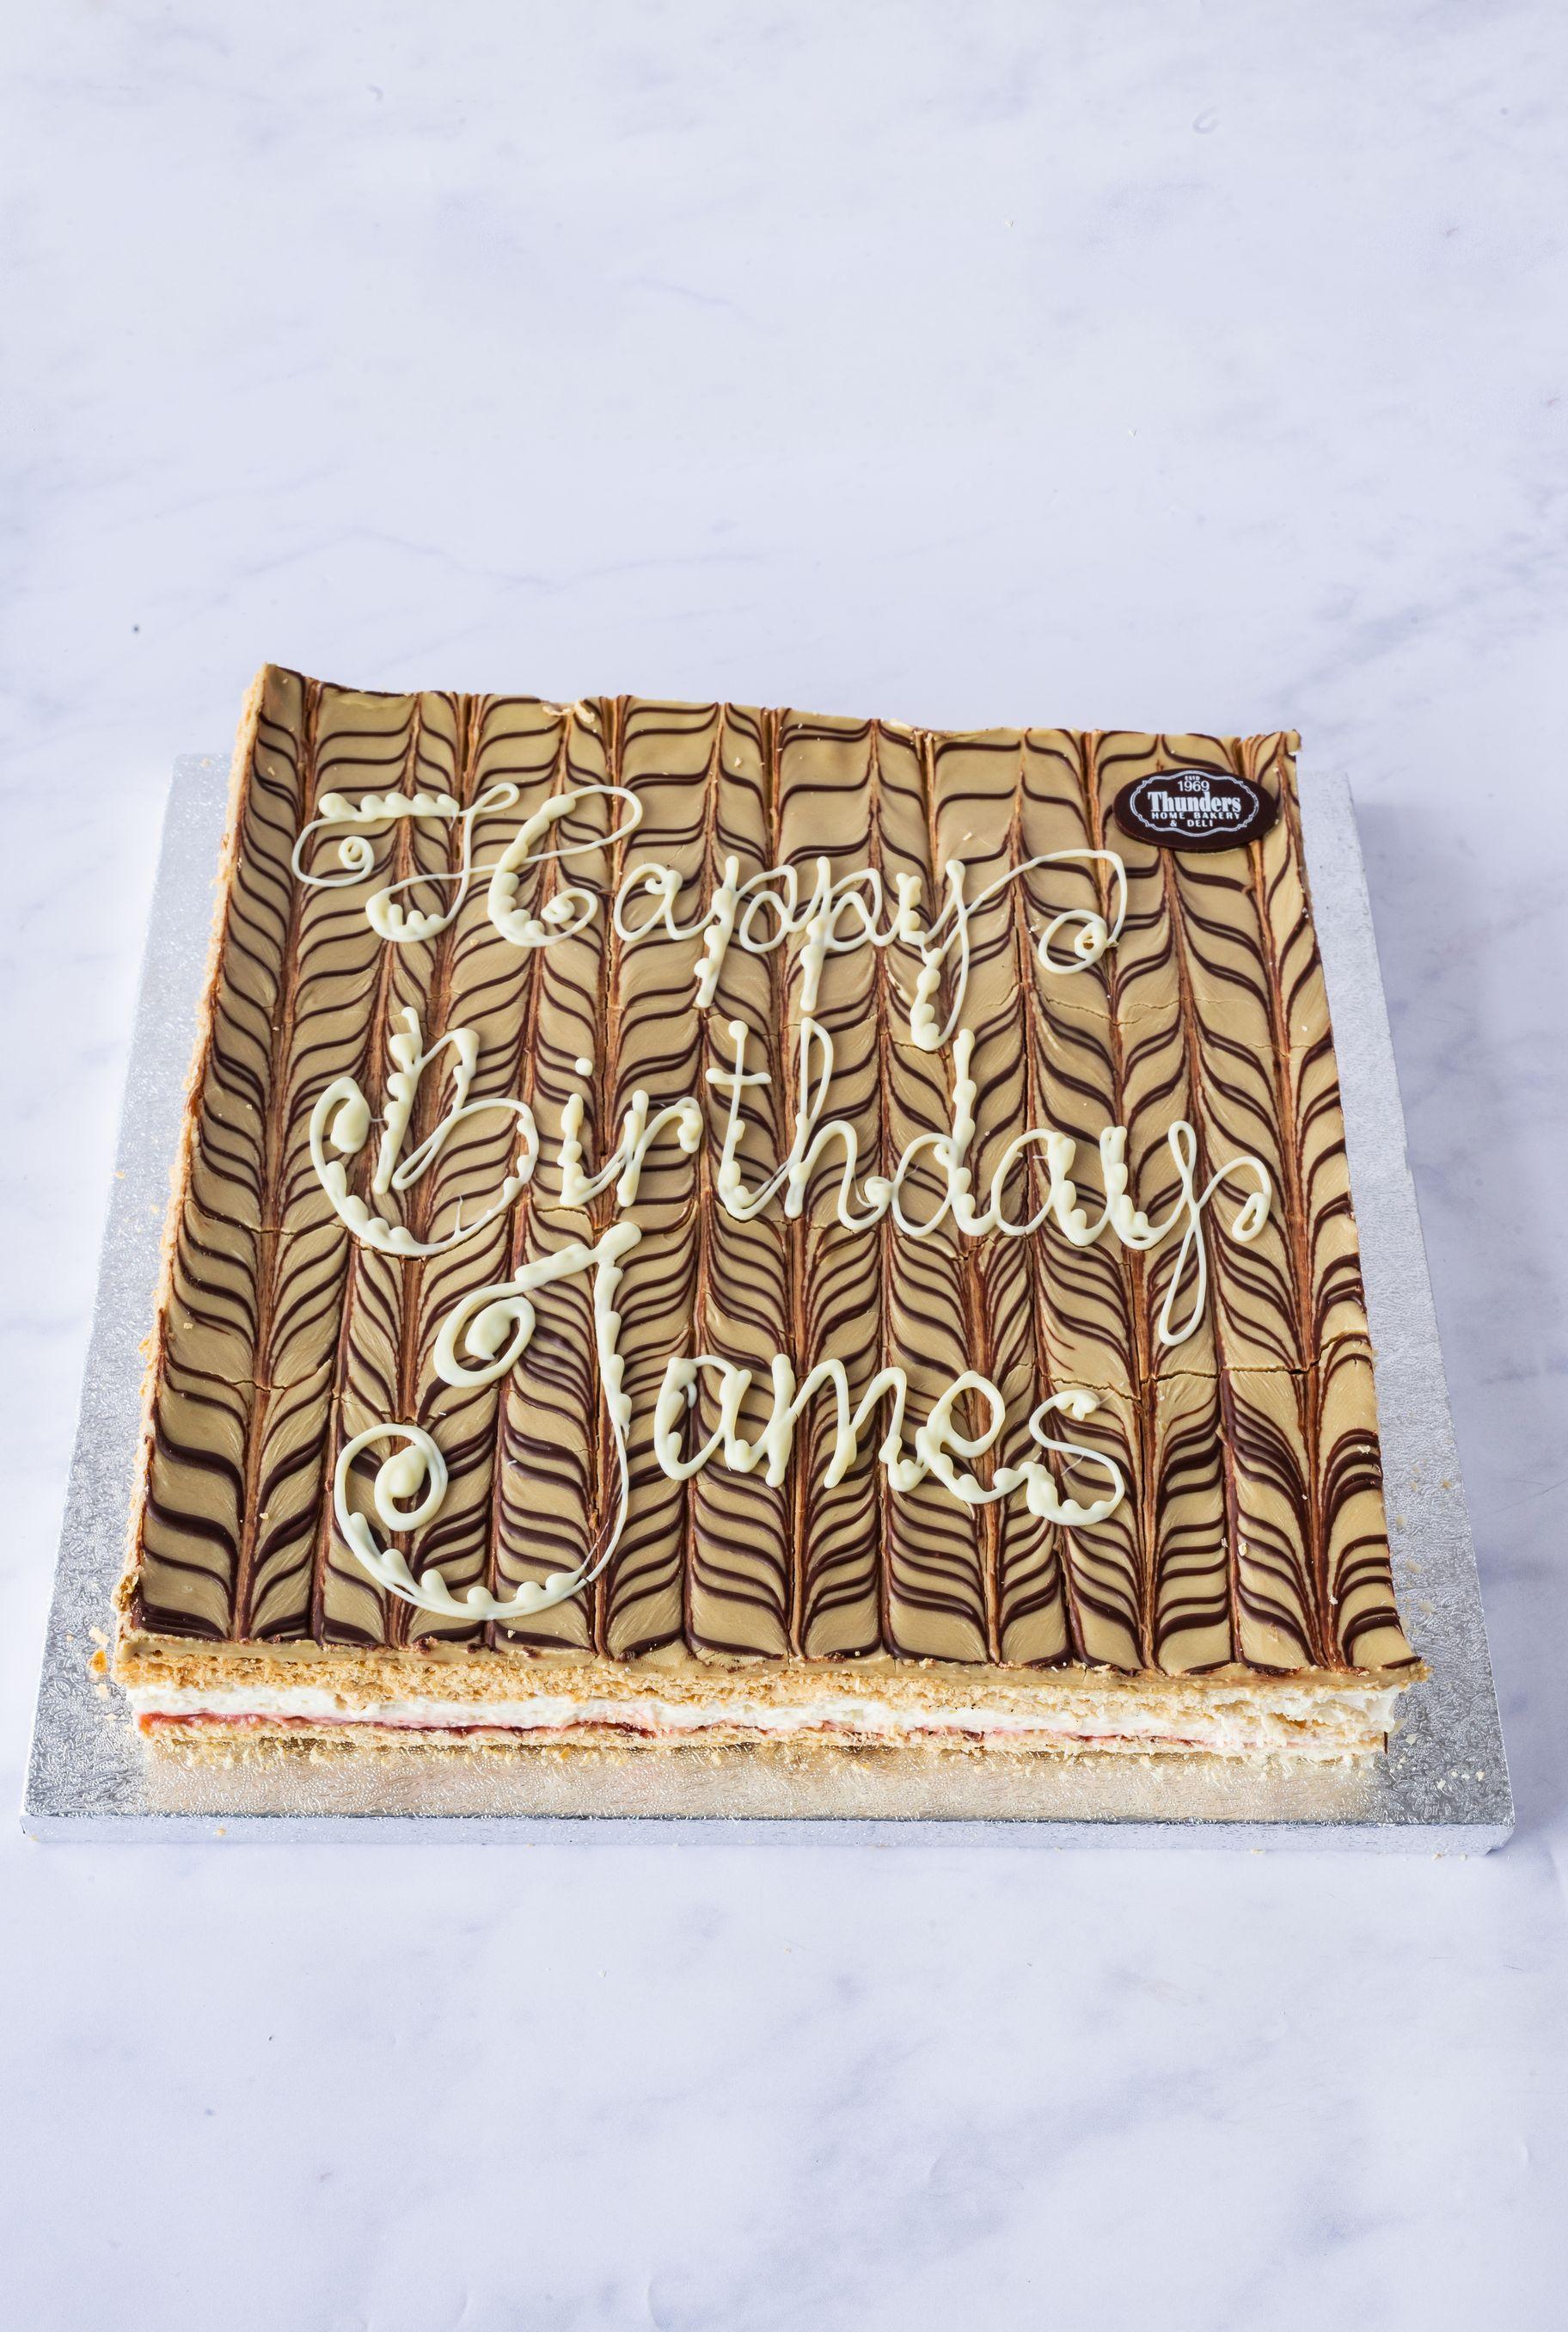 Thunders Coffee Slice Cake